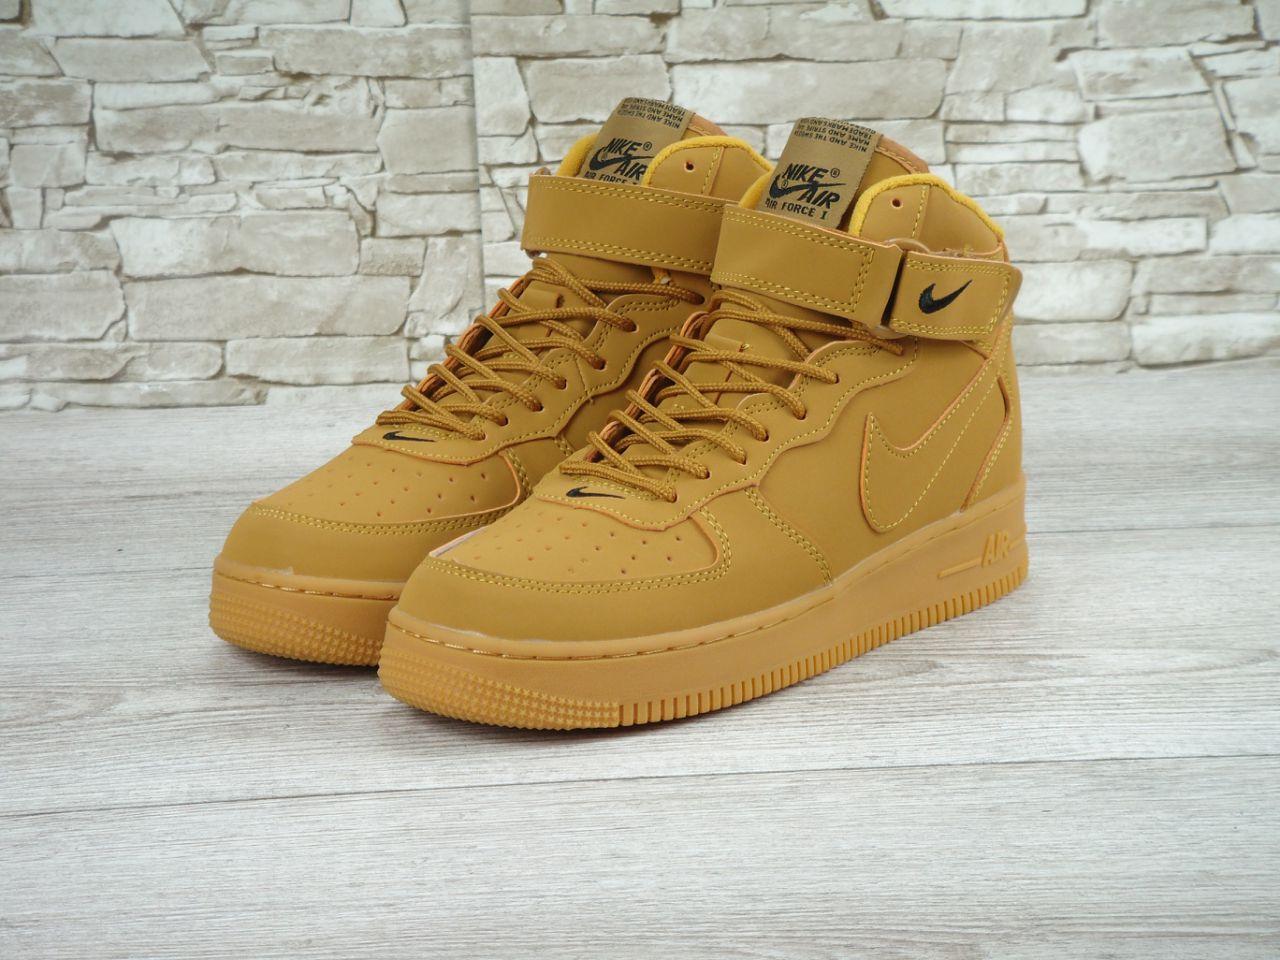 Кроссовки мужские Найк Nike Air Force 1 light brown. ТОП Реплика ААА класса.